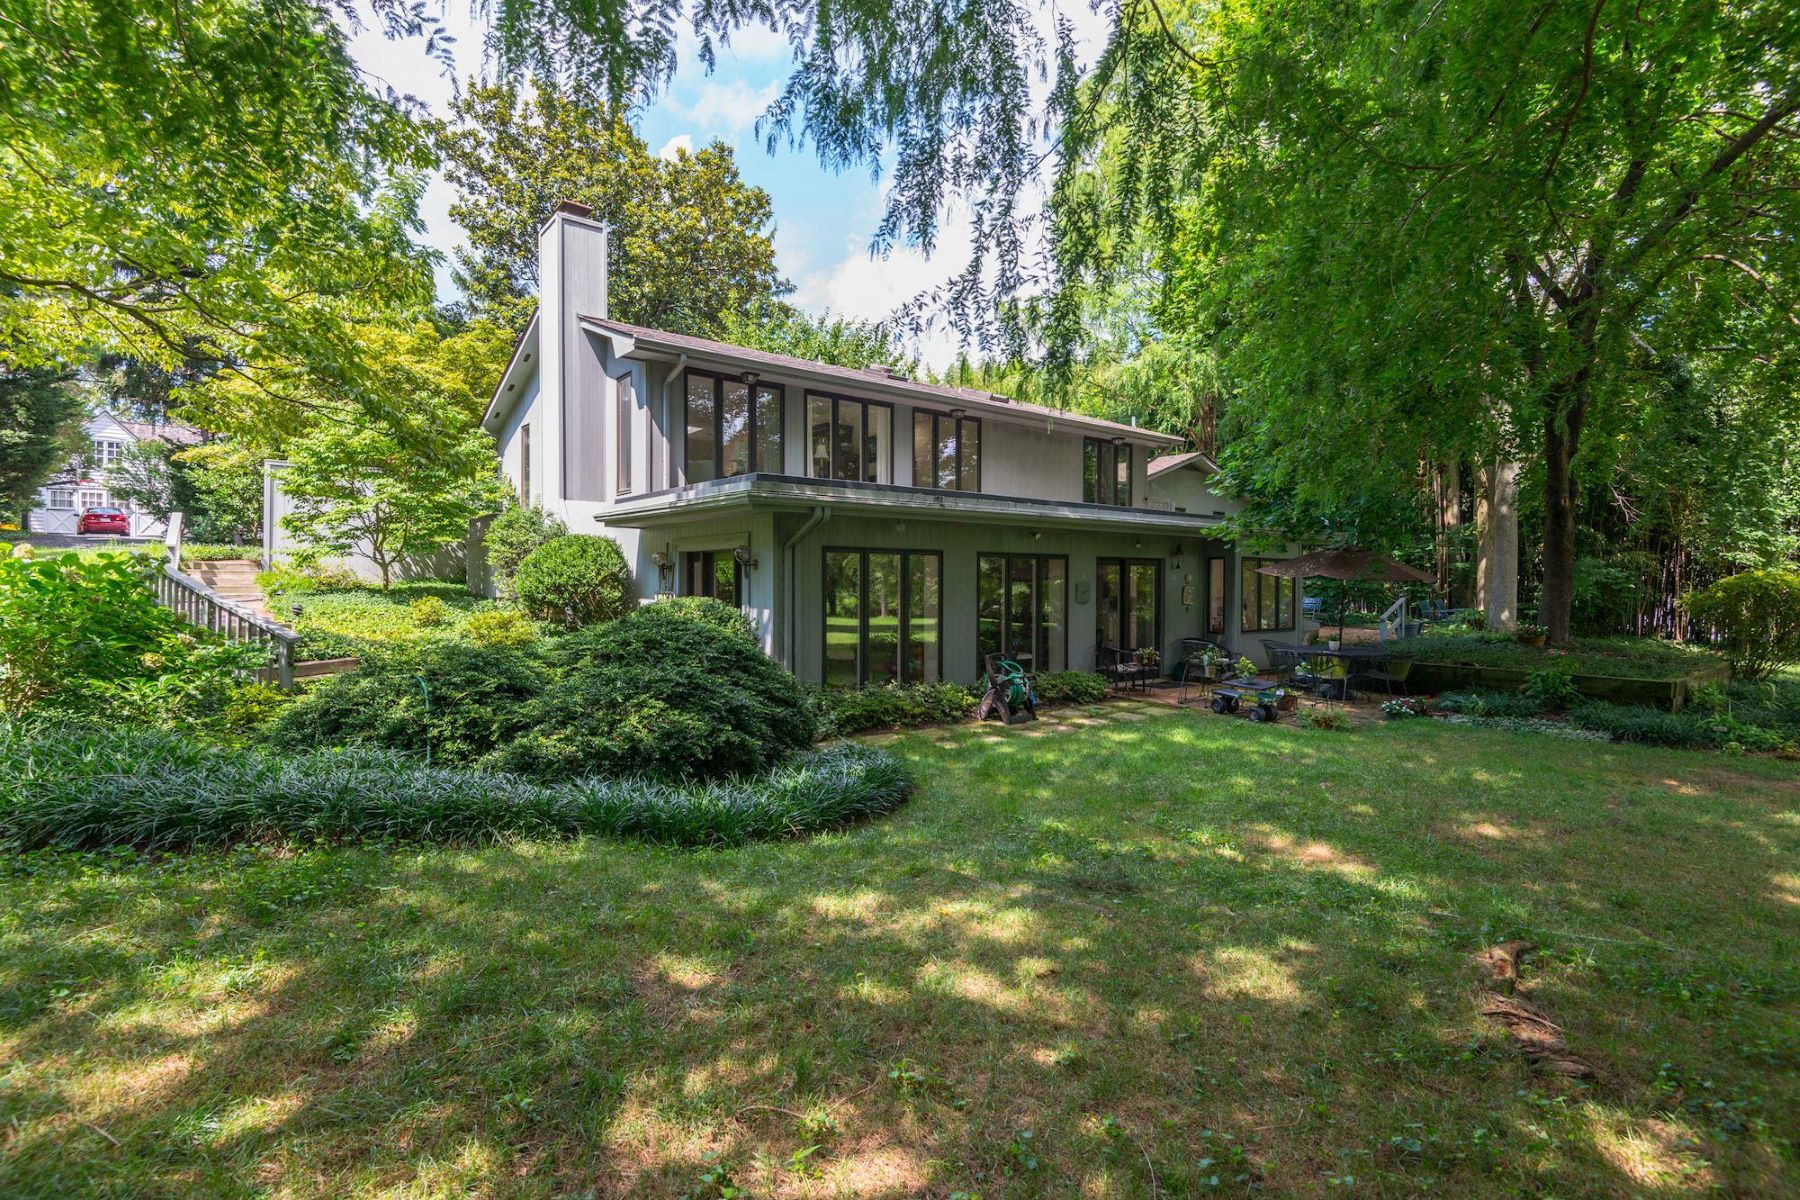 Casa Unifamiliar por un Venta en 1745 Banbury Rd 1745 Banbury Rd Gibson Island, Maryland 21056 Estados Unidos